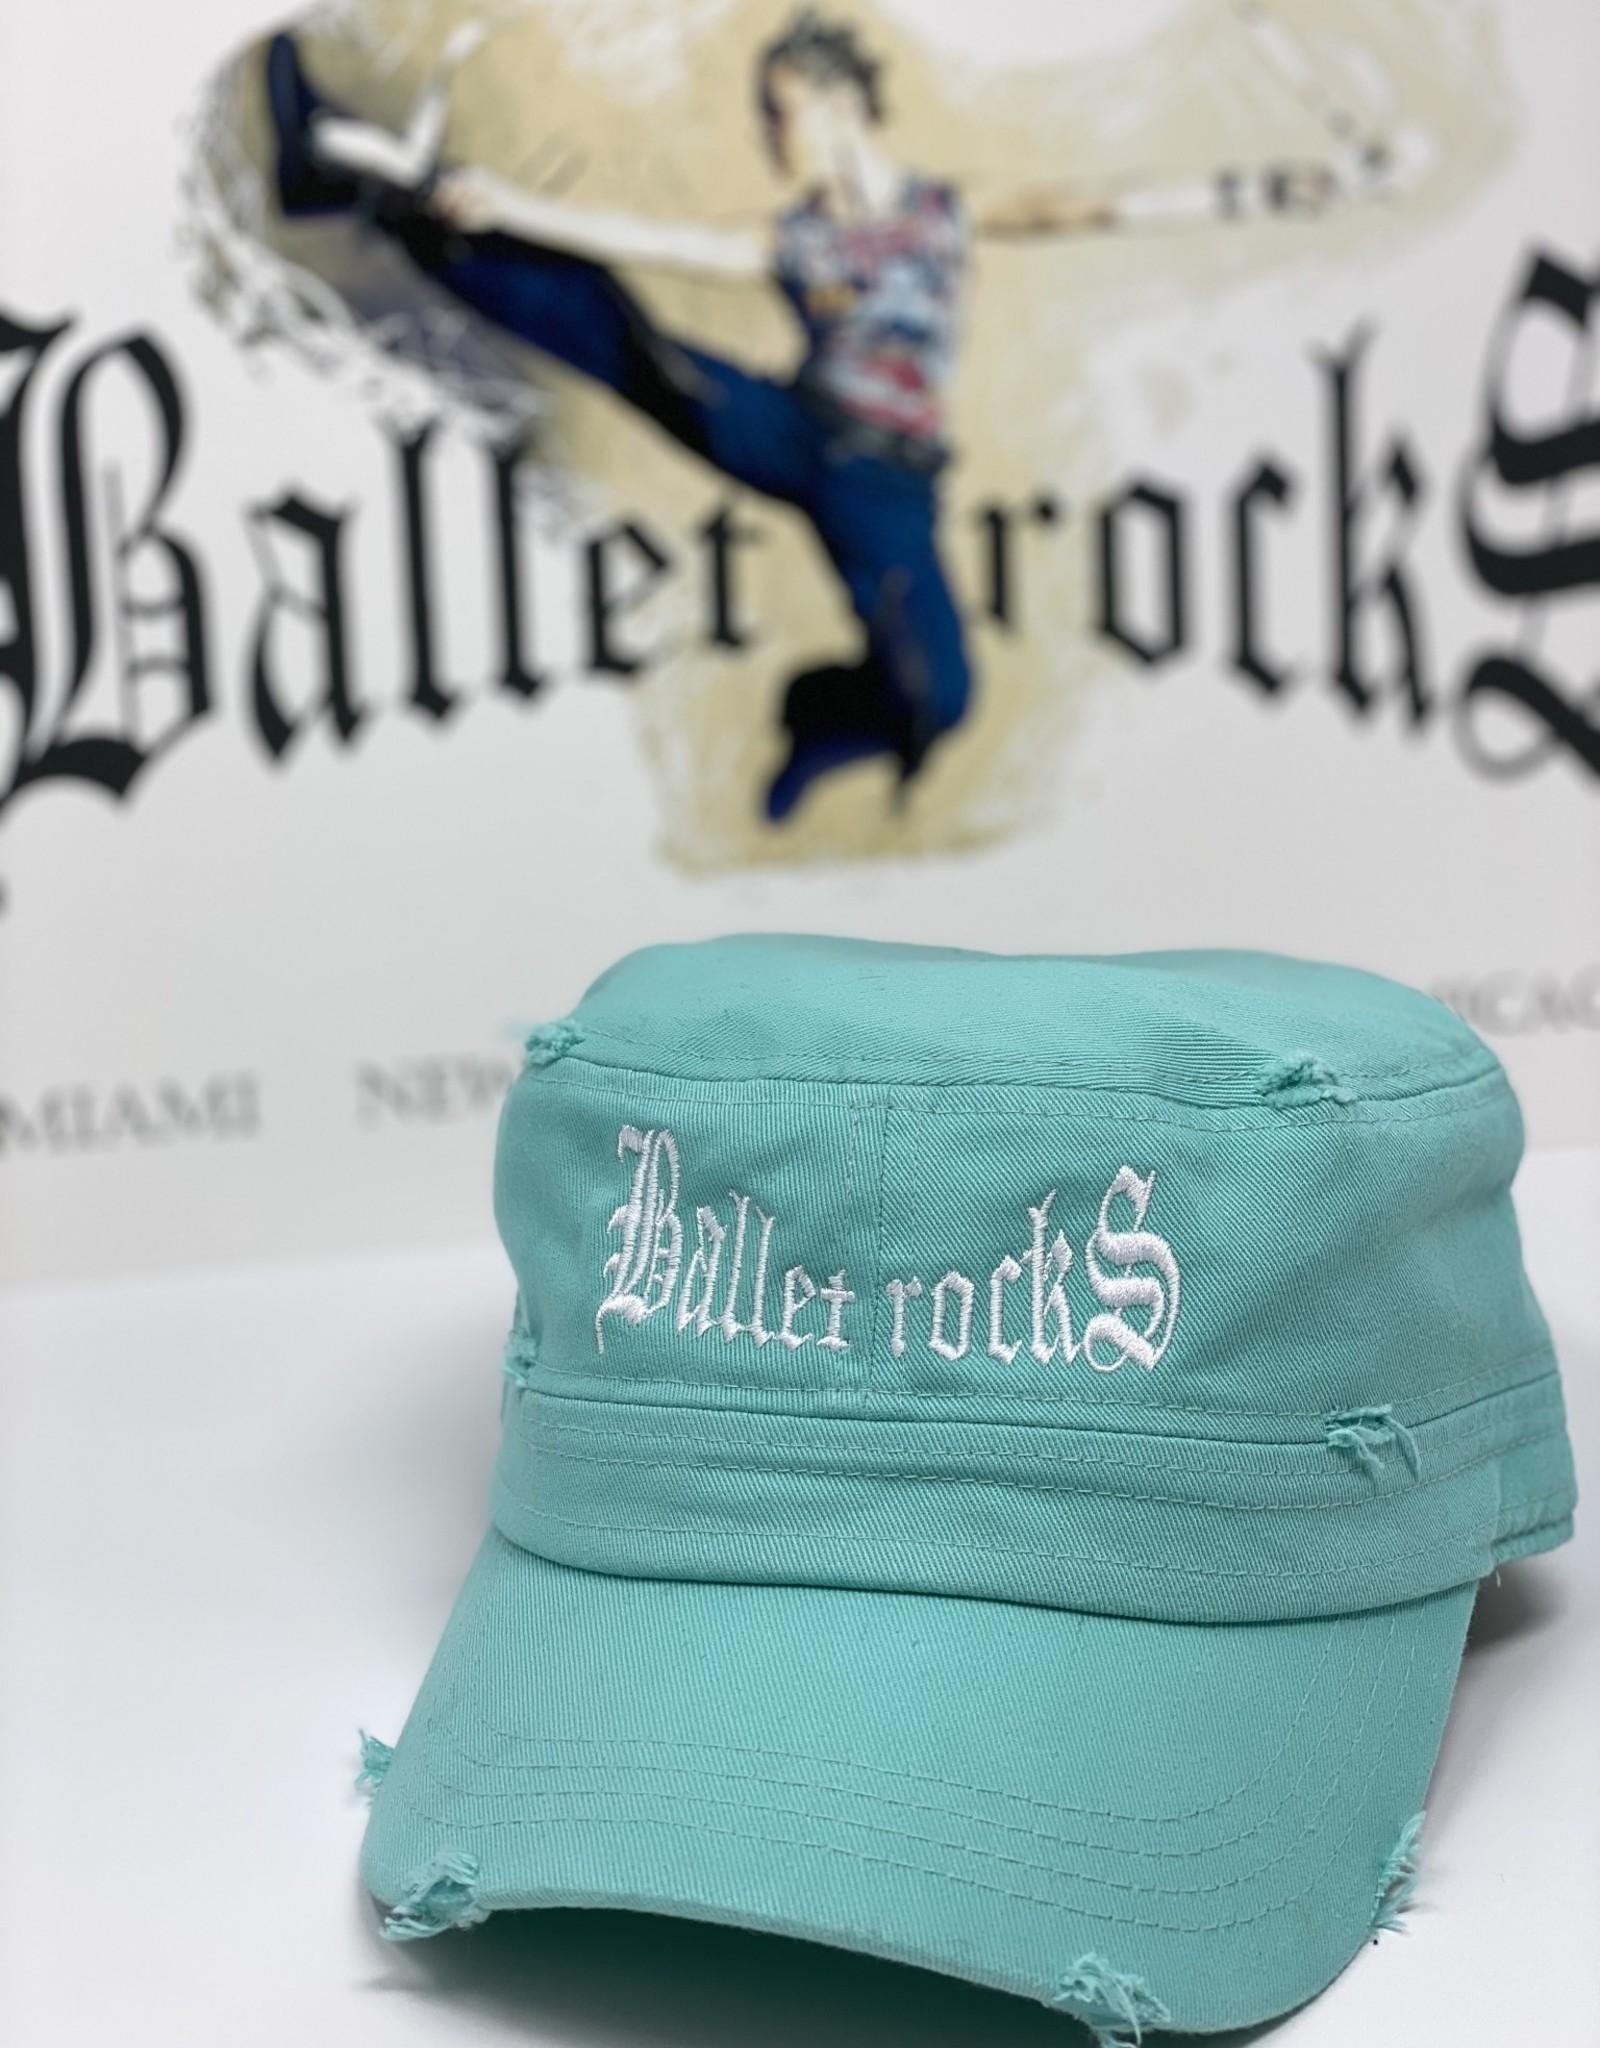 Ballet Rocks Ballet Rocks Rockin Hats